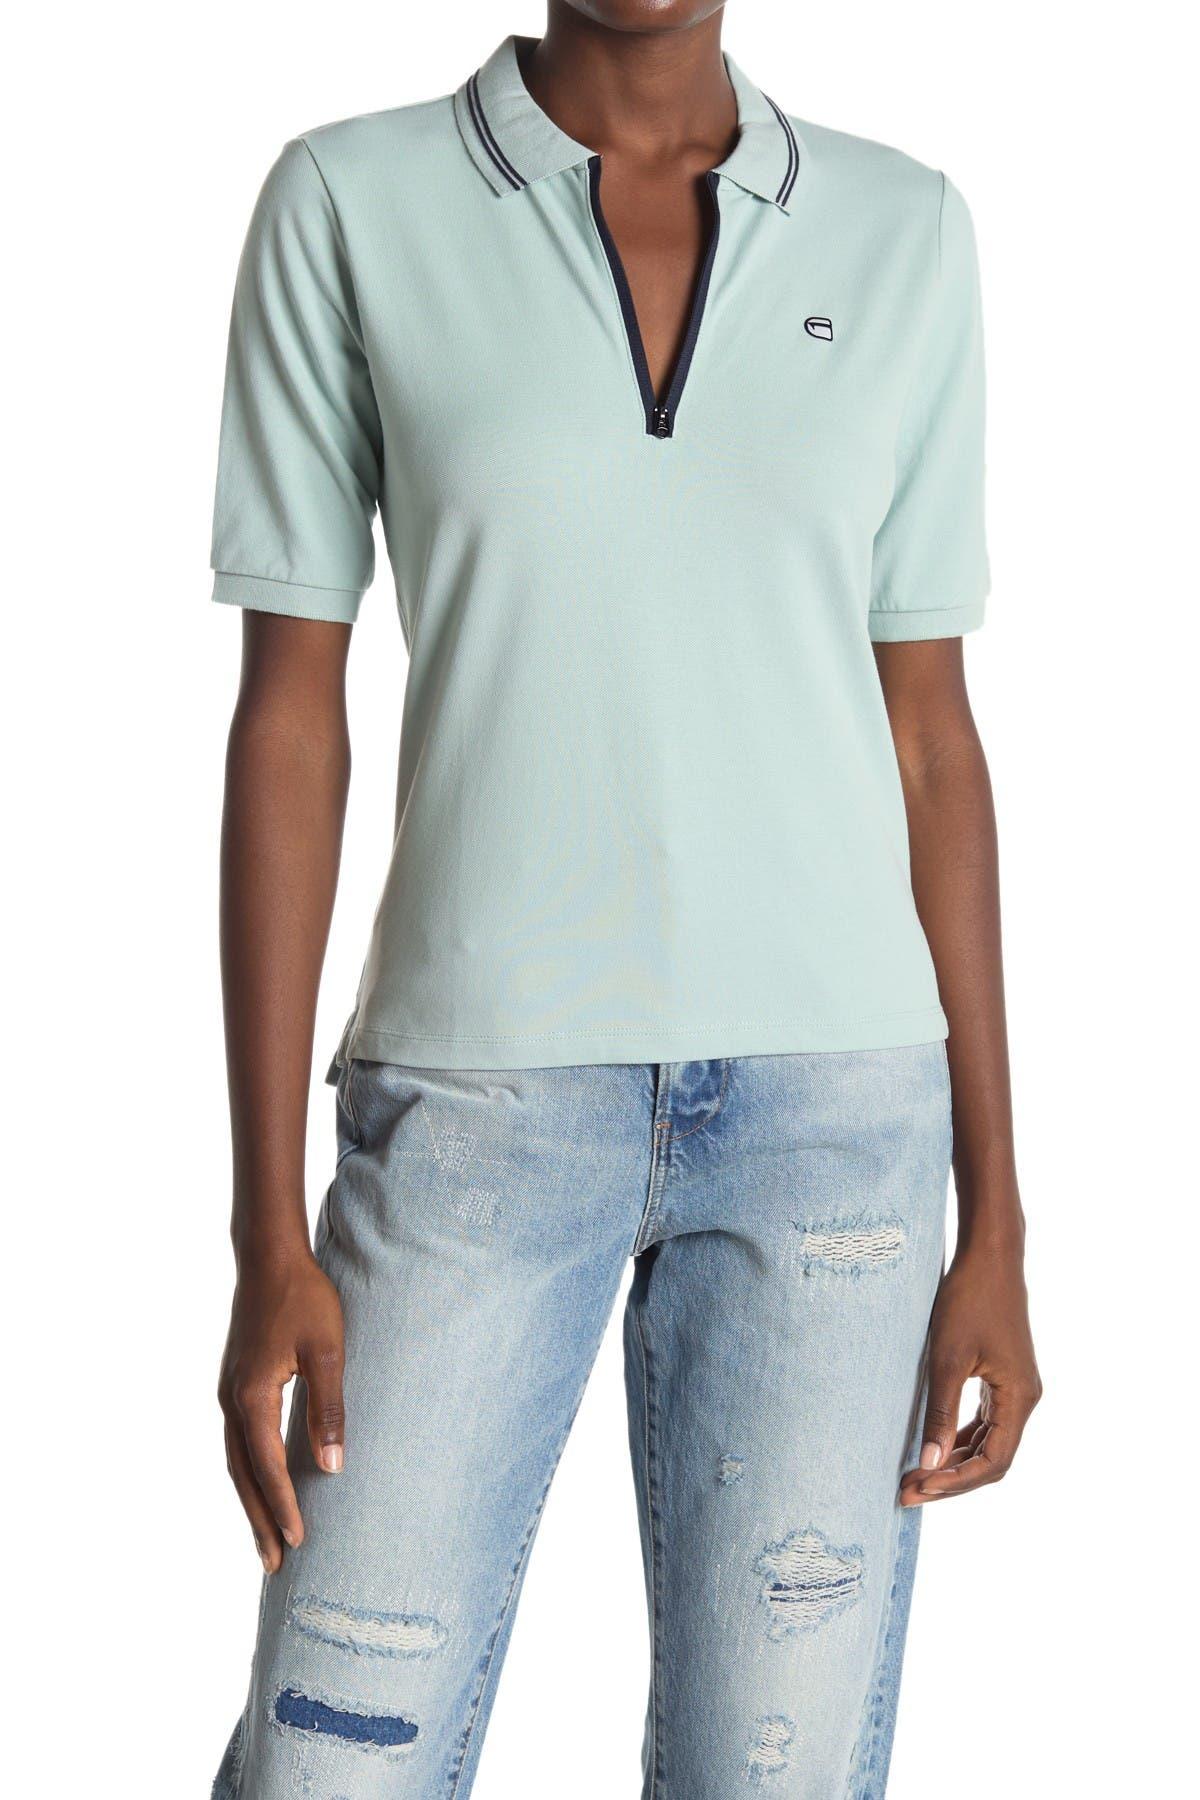 Image of G-STAR RAW Slim Polo Shirt